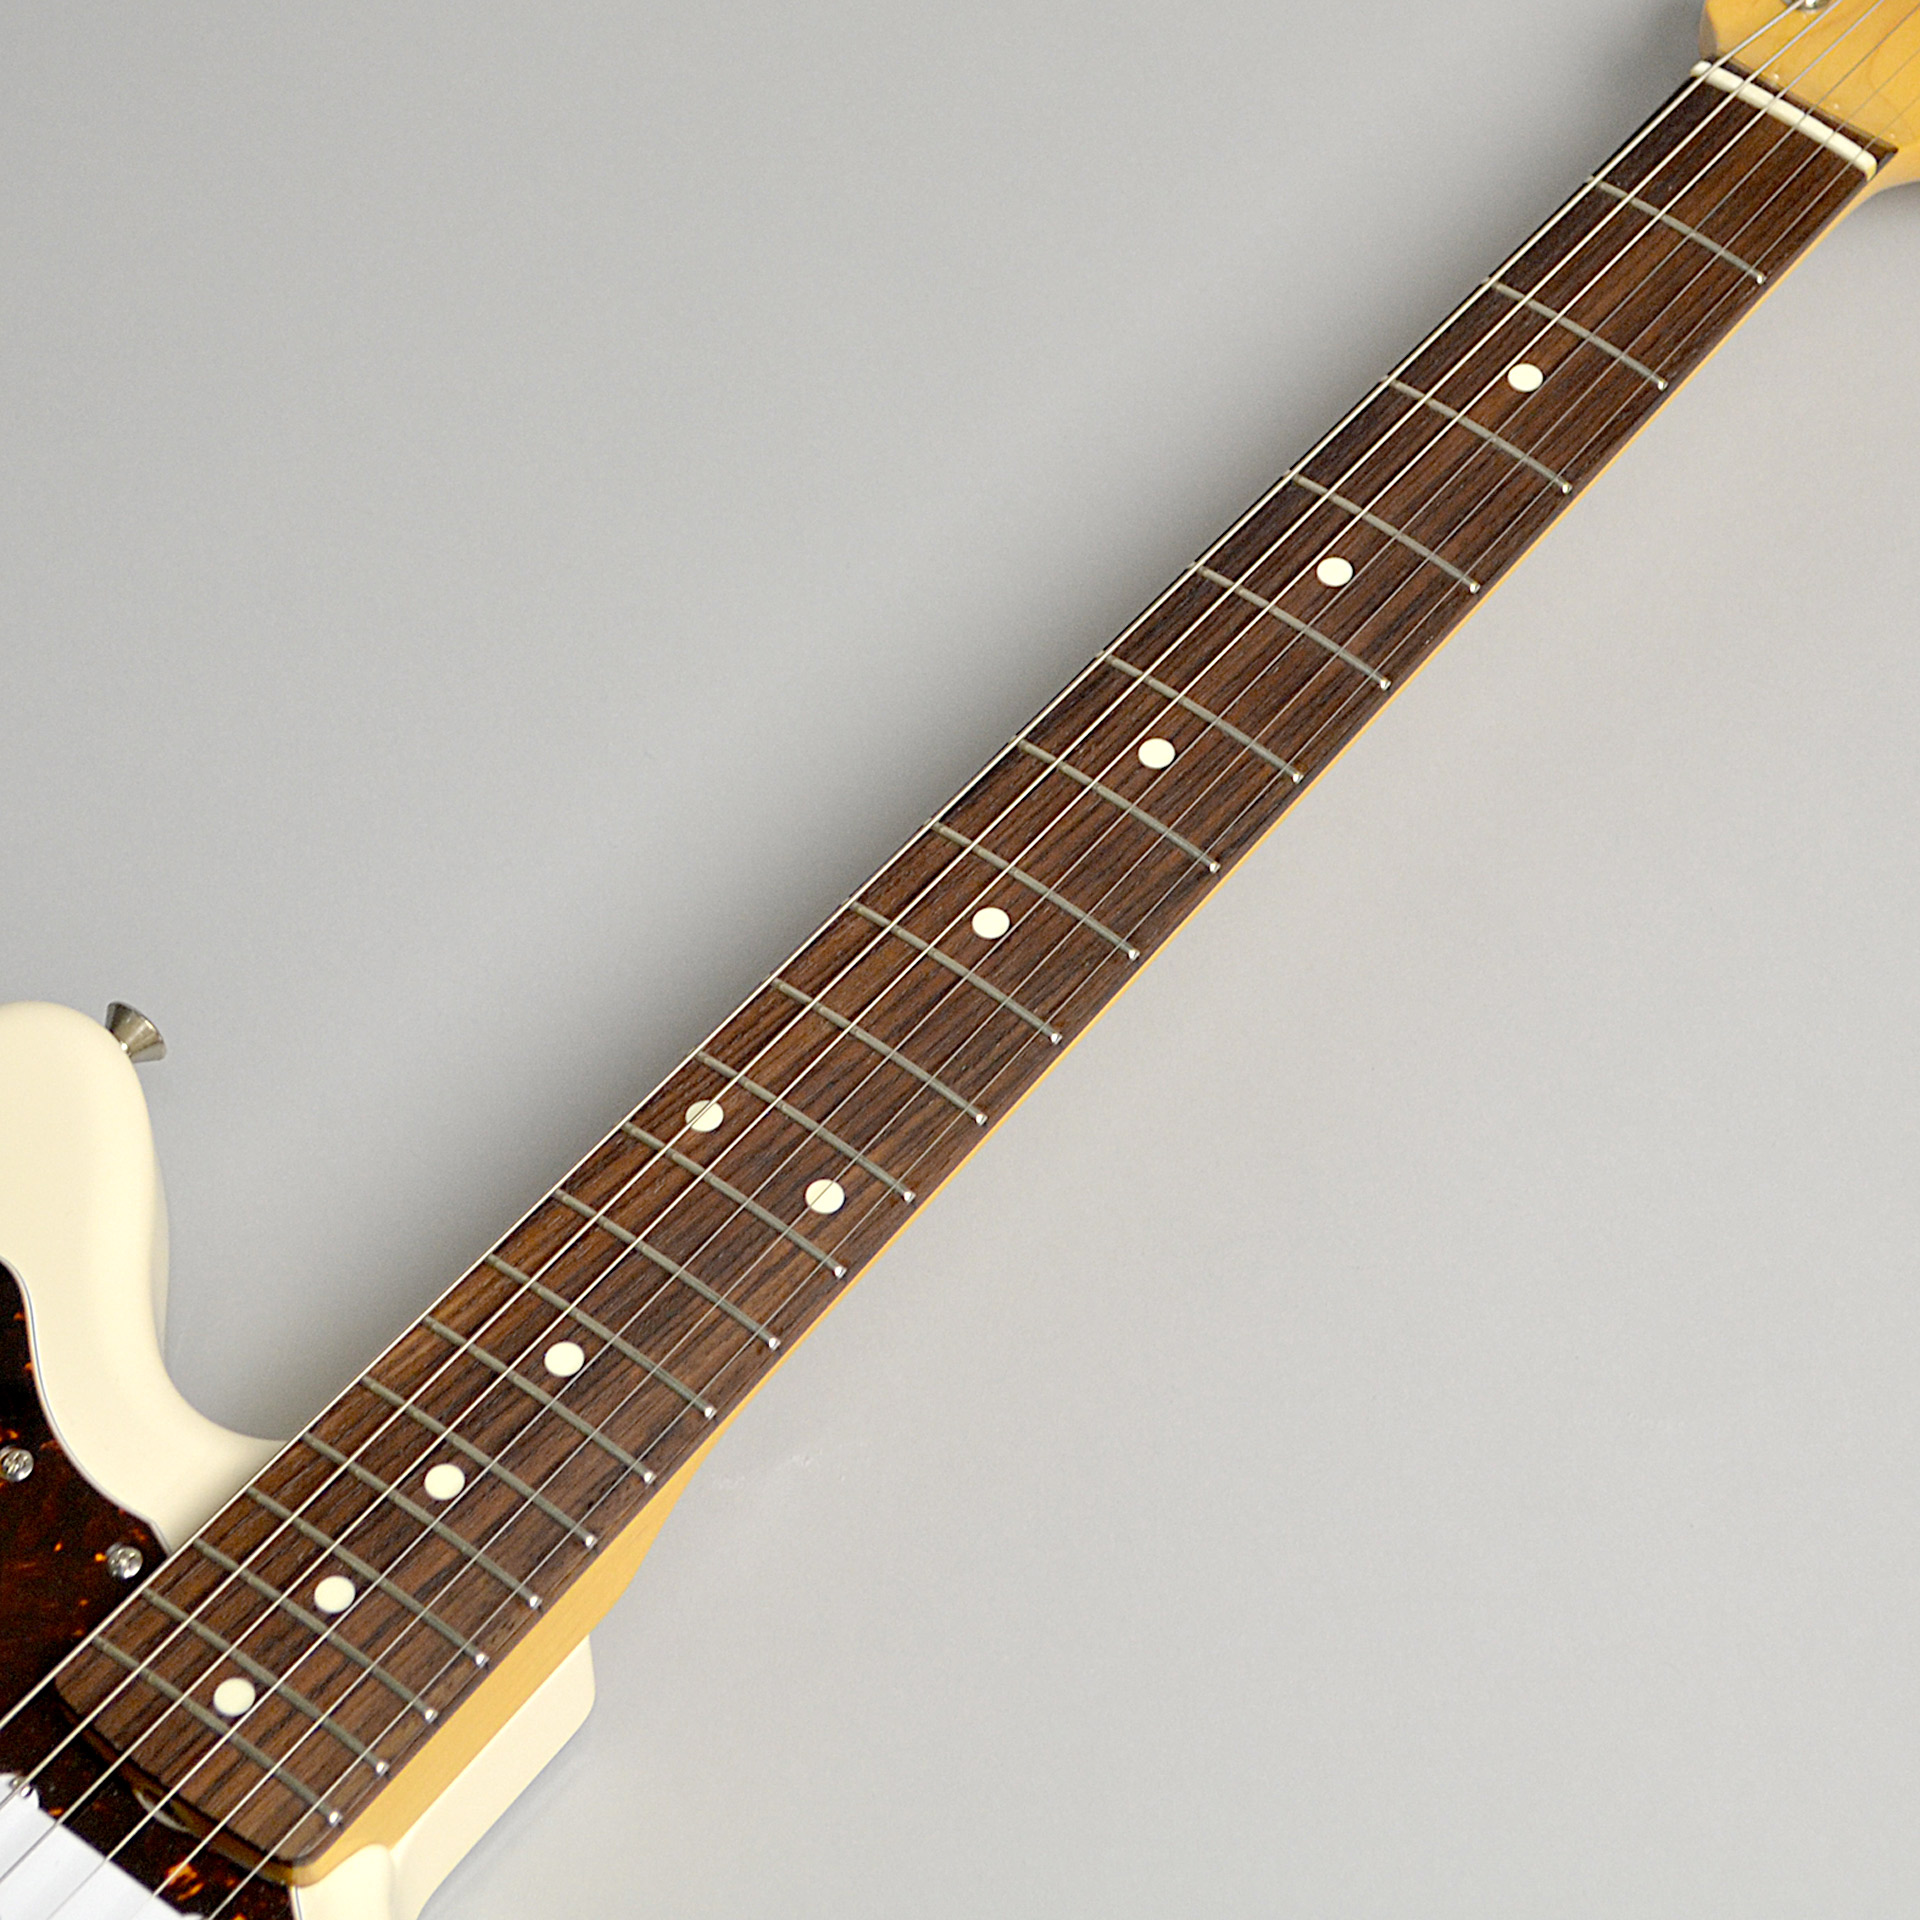 Japan Exclusive Classic 60s Jazzmaster Vintage Whiteのヘッド裏-アップ画像